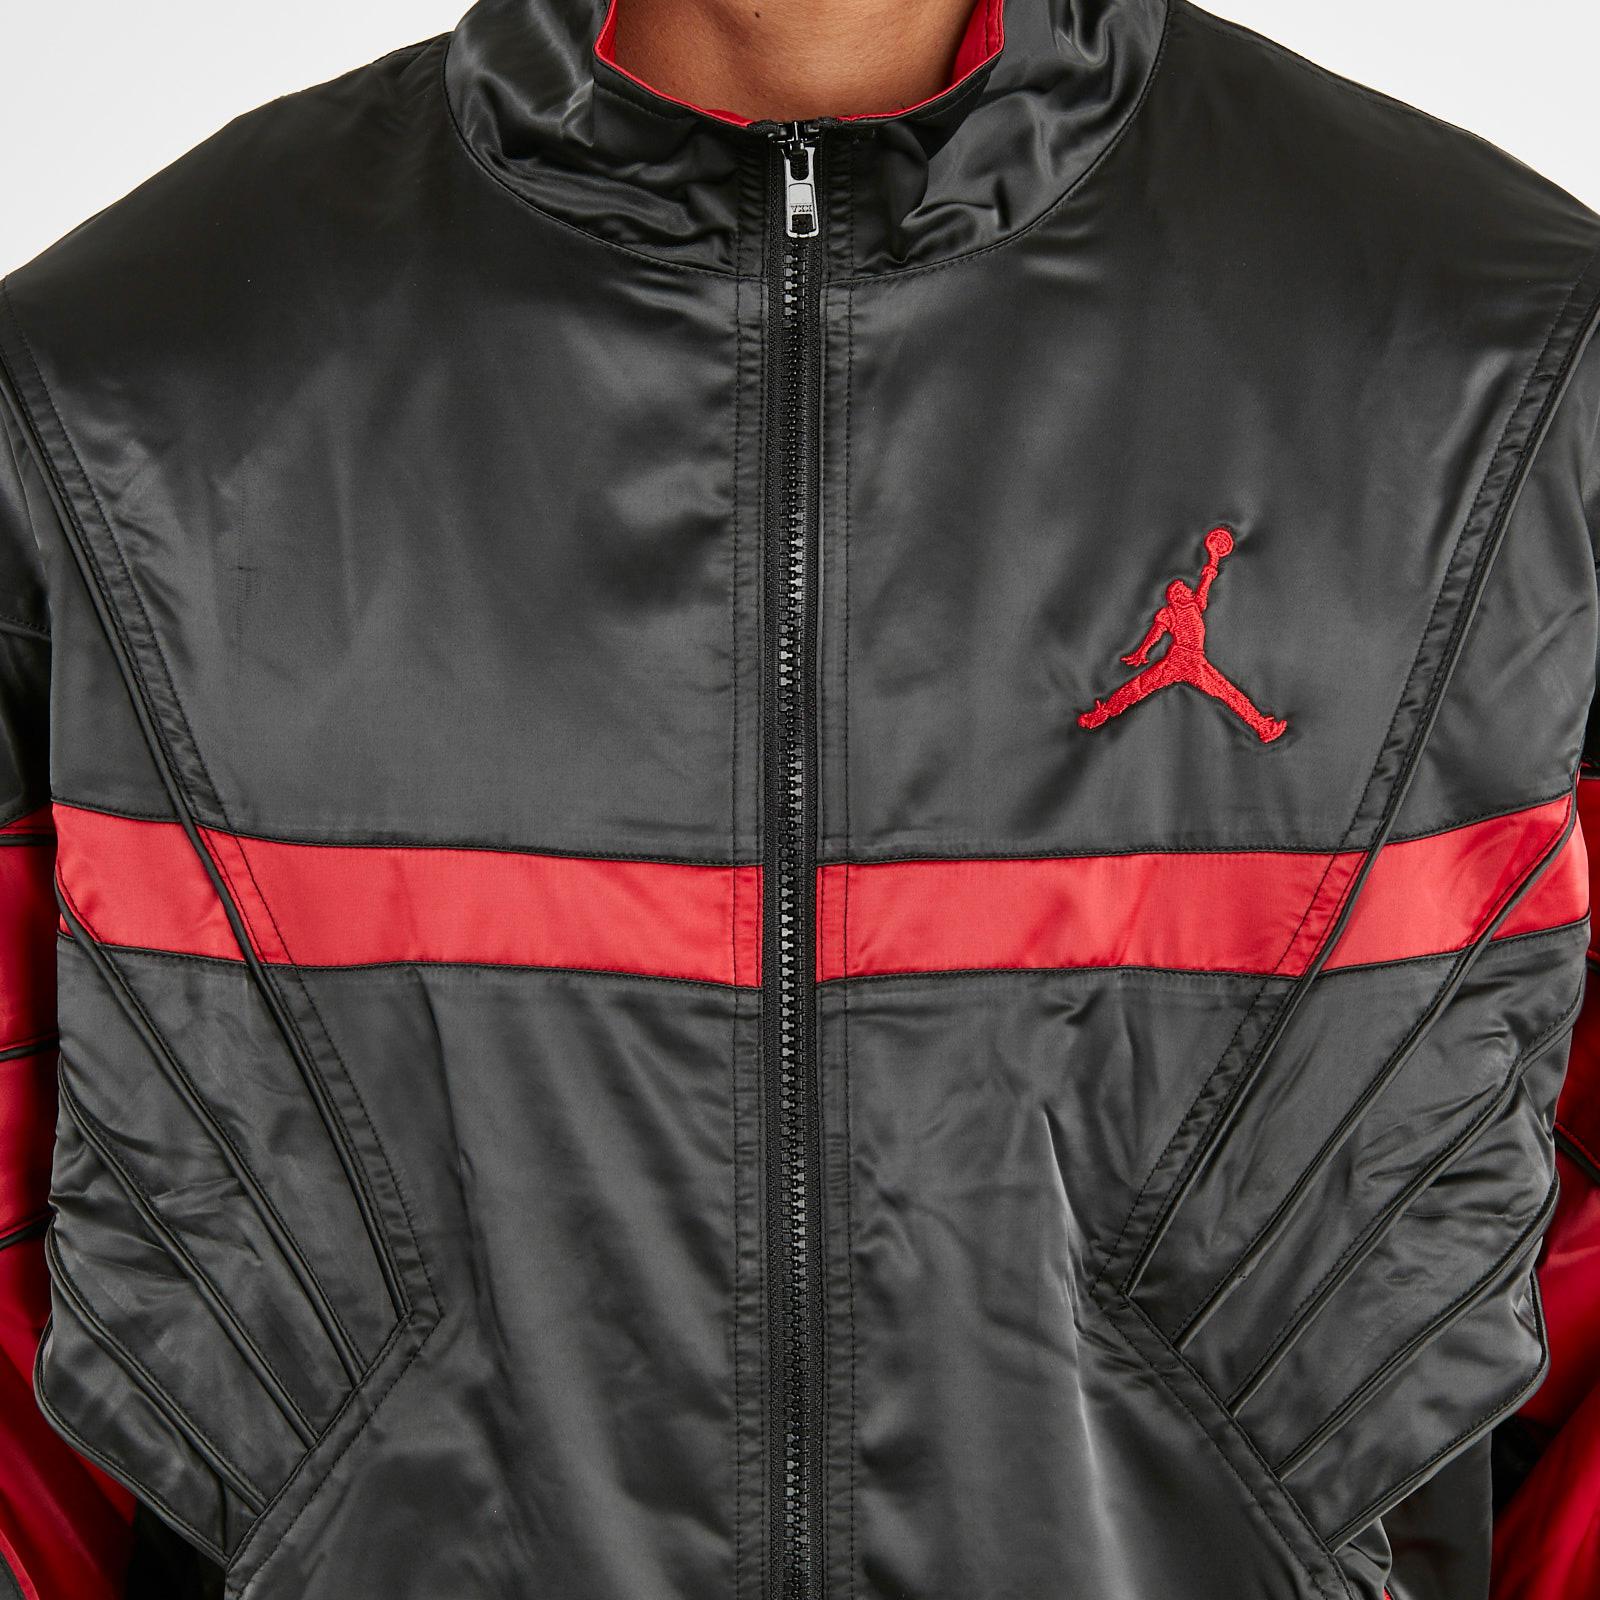 fe0a8510bc158b Jordan Brand AJ5 Satin Jacket - Ar3130-010 - Sneakersnstuff ...